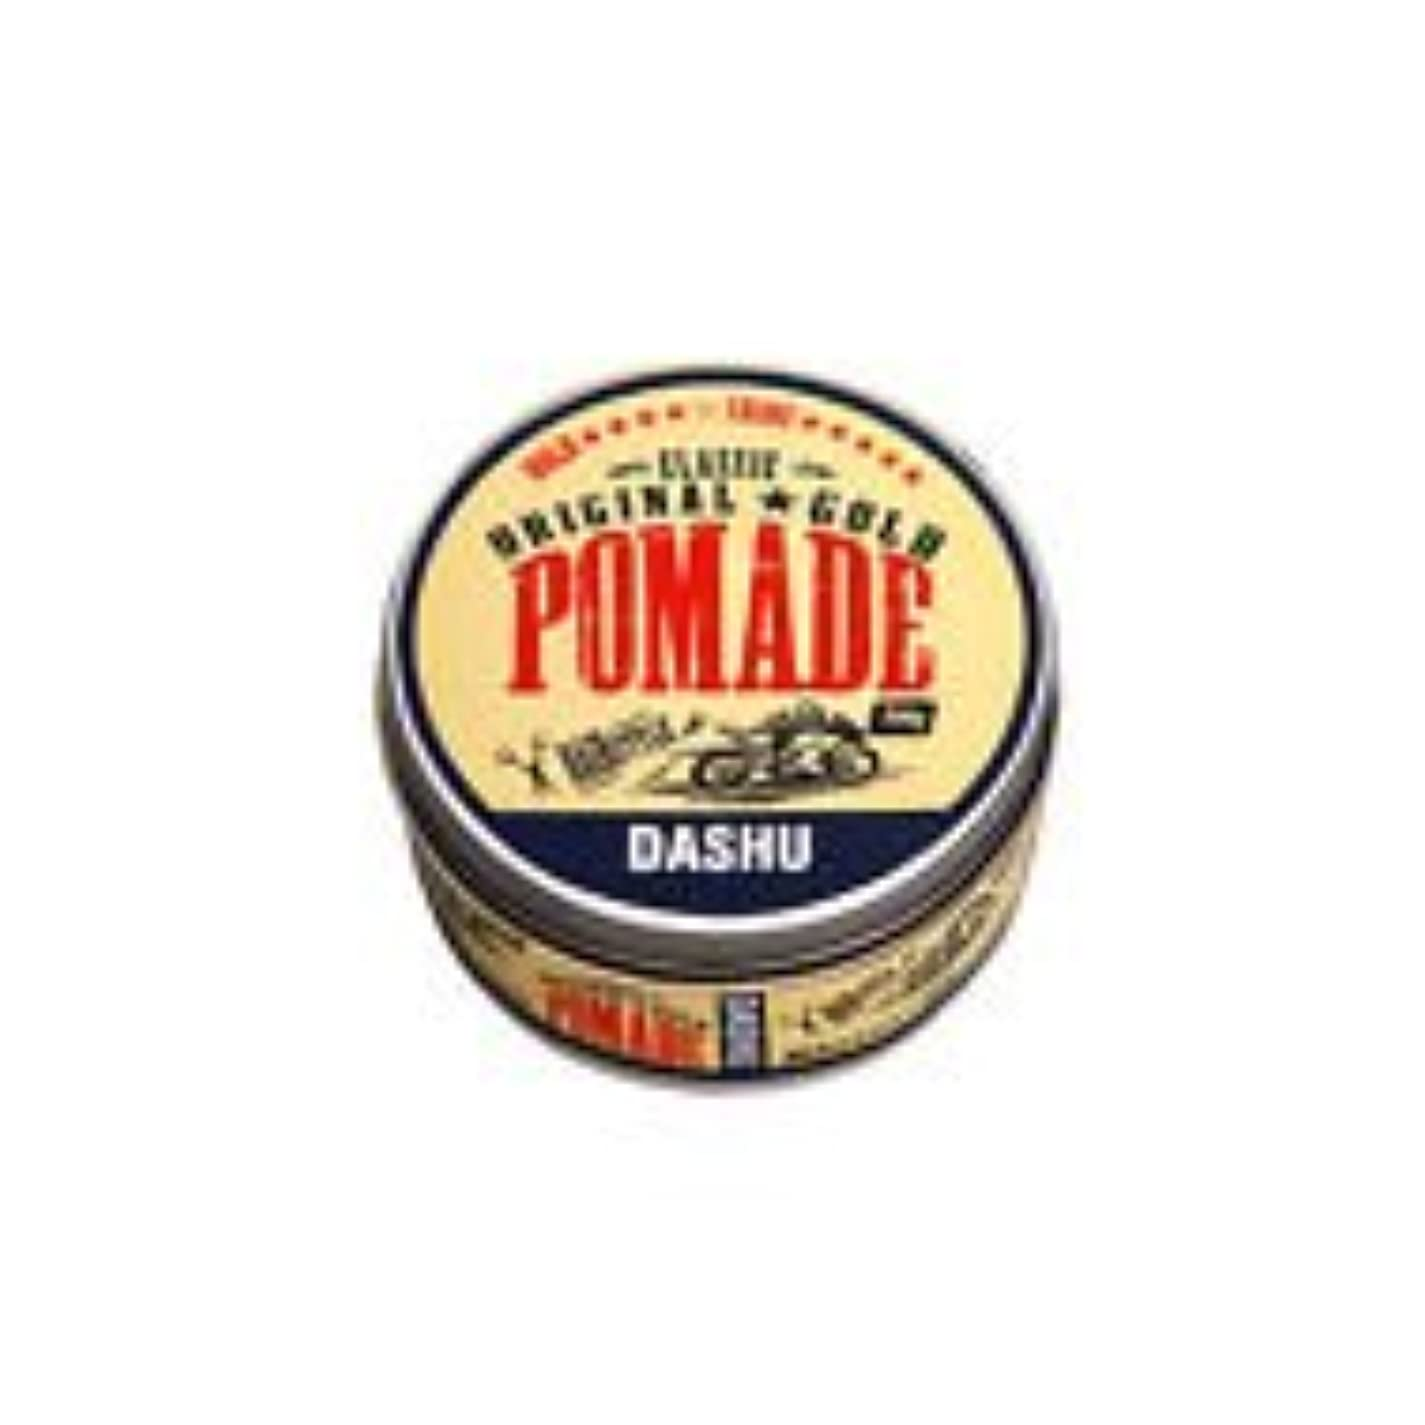 [DASHU] ダシュ クラシックオリジナルゴールドポマードヘアワックス Classic Original Gold Pomade Hair Wax 100ml / 韓国製 . 韓国直送品